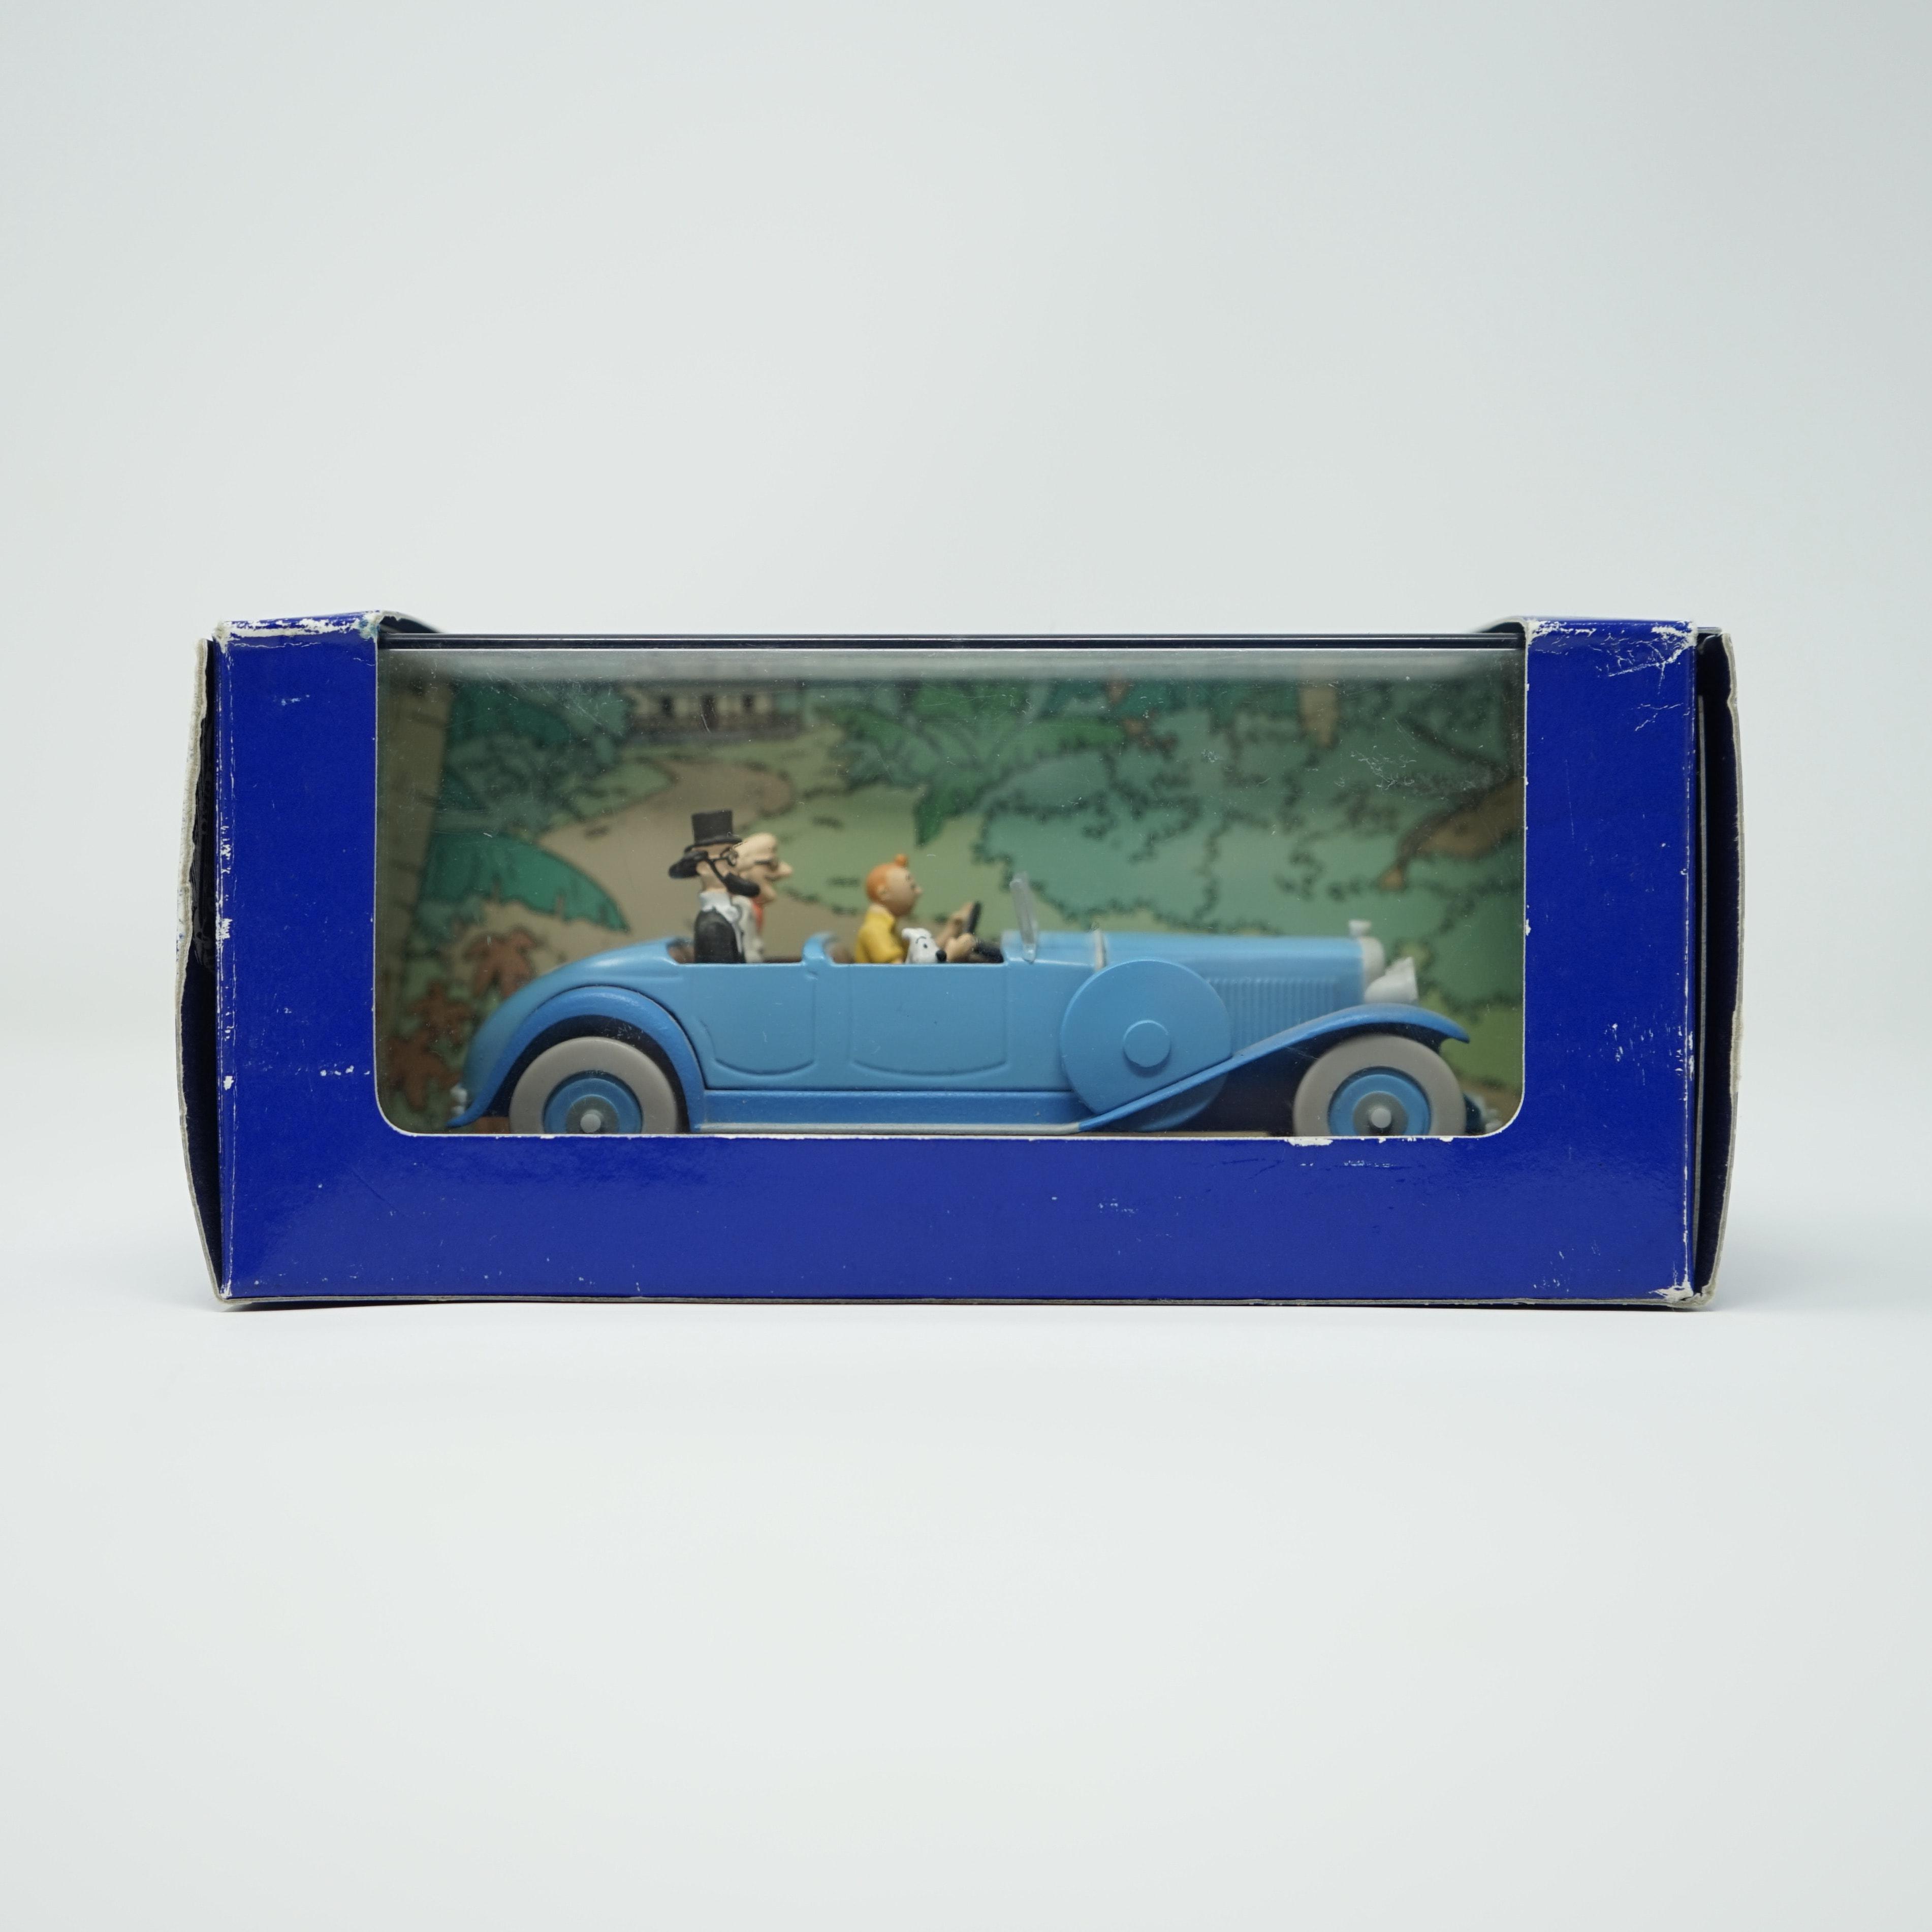 La Lincoln Torpedo des Cigares du Pharaon En Voiture Tintin Éditions Atlas